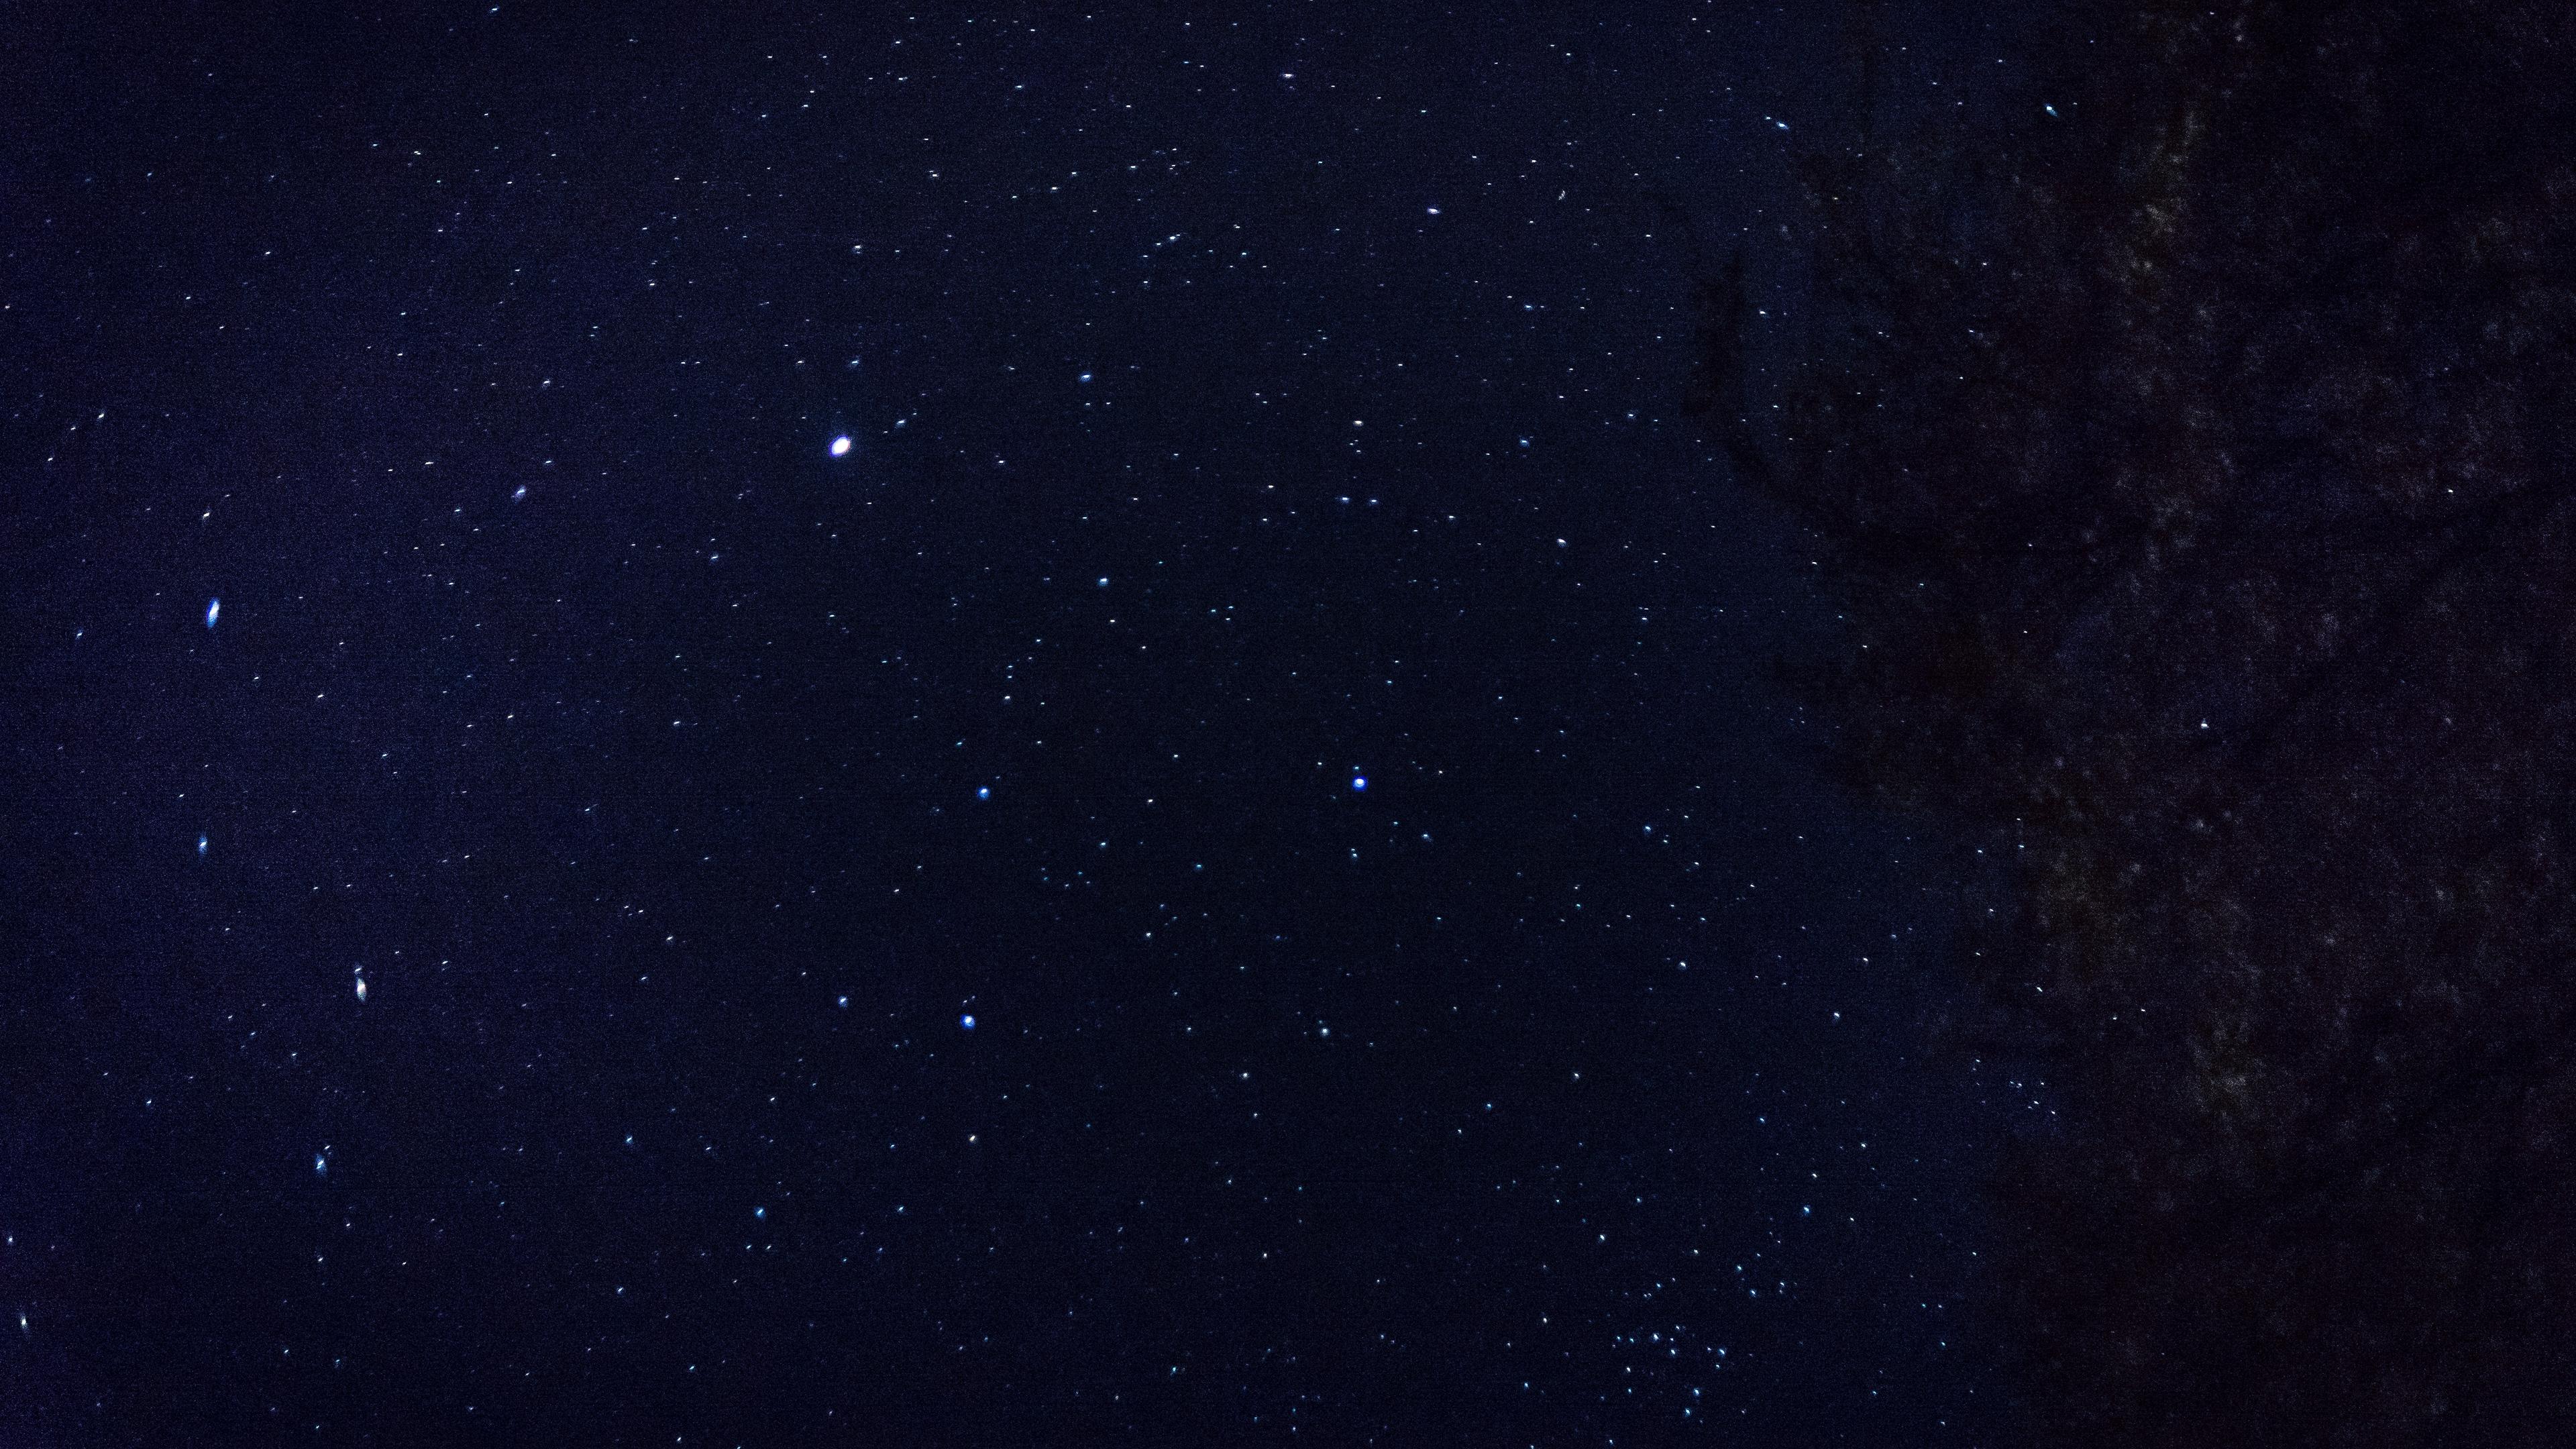 starry sky stars space 4k 1536013813 - starry sky, stars, space 4k - Stars, starry sky, Space